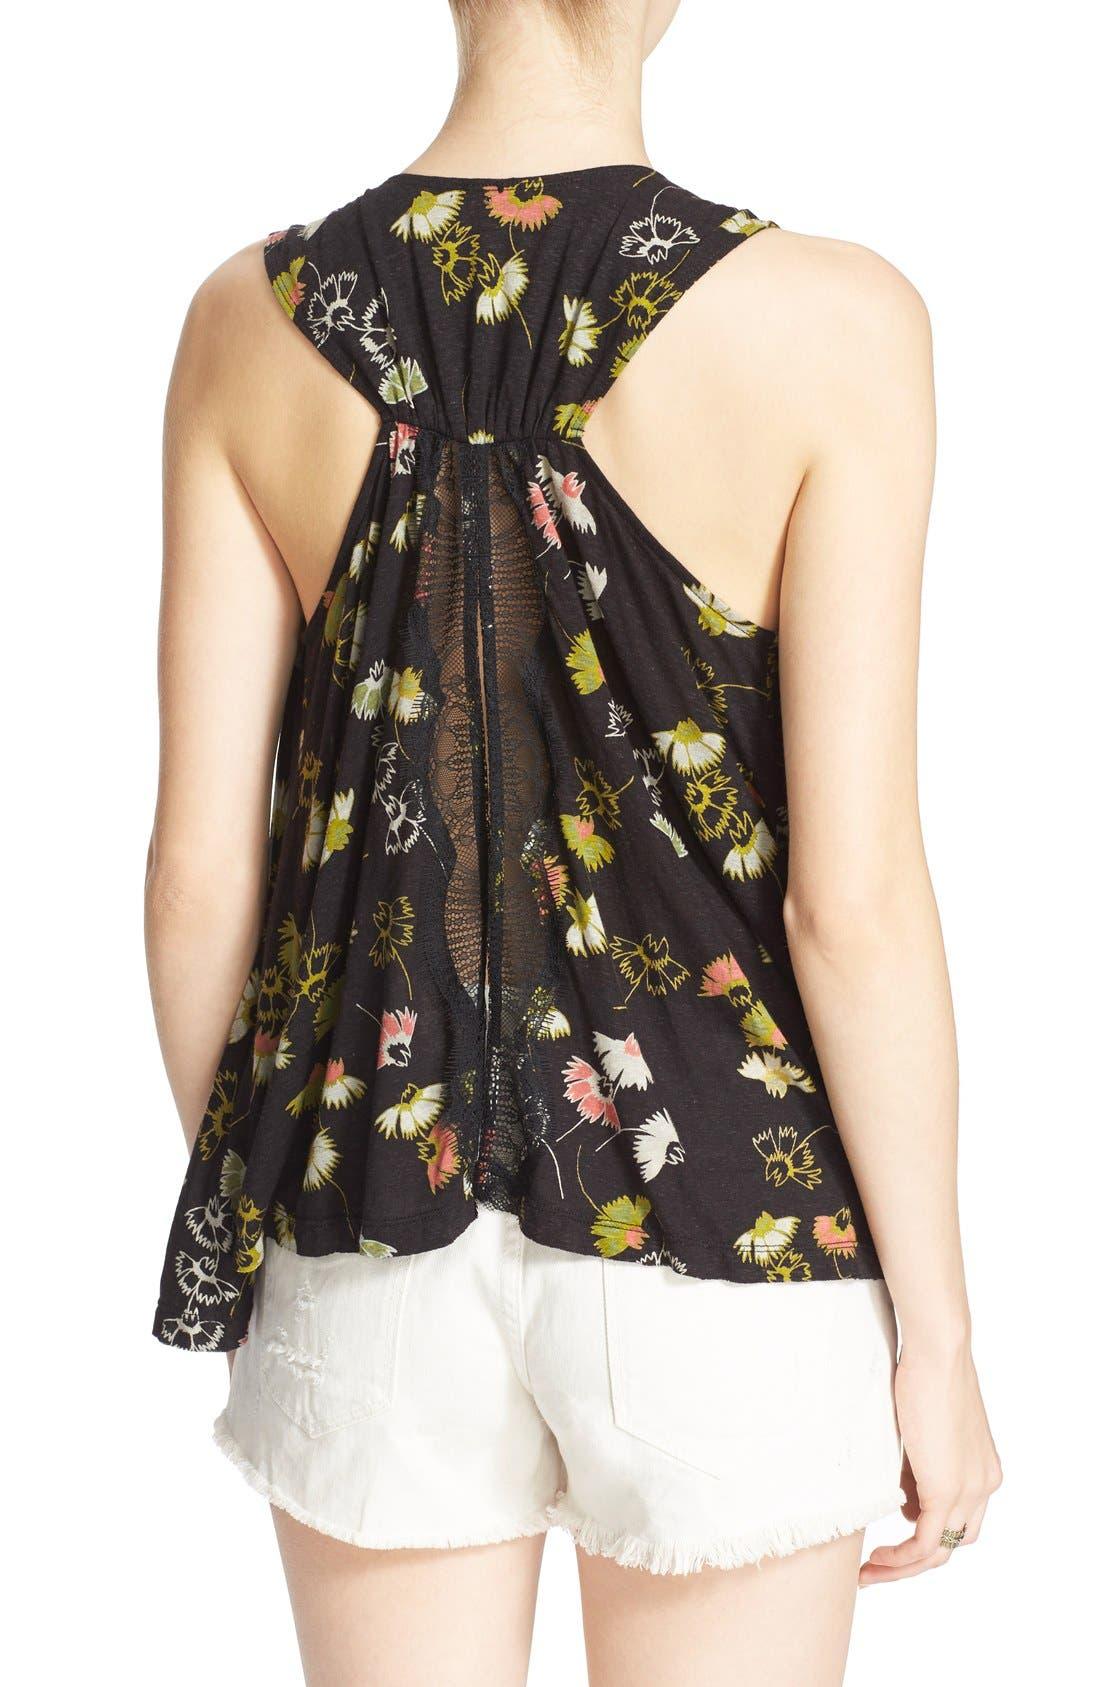 'Love Potion' Floral Print Sleeveless Knit Top,                             Alternate thumbnail 5, color,                             001